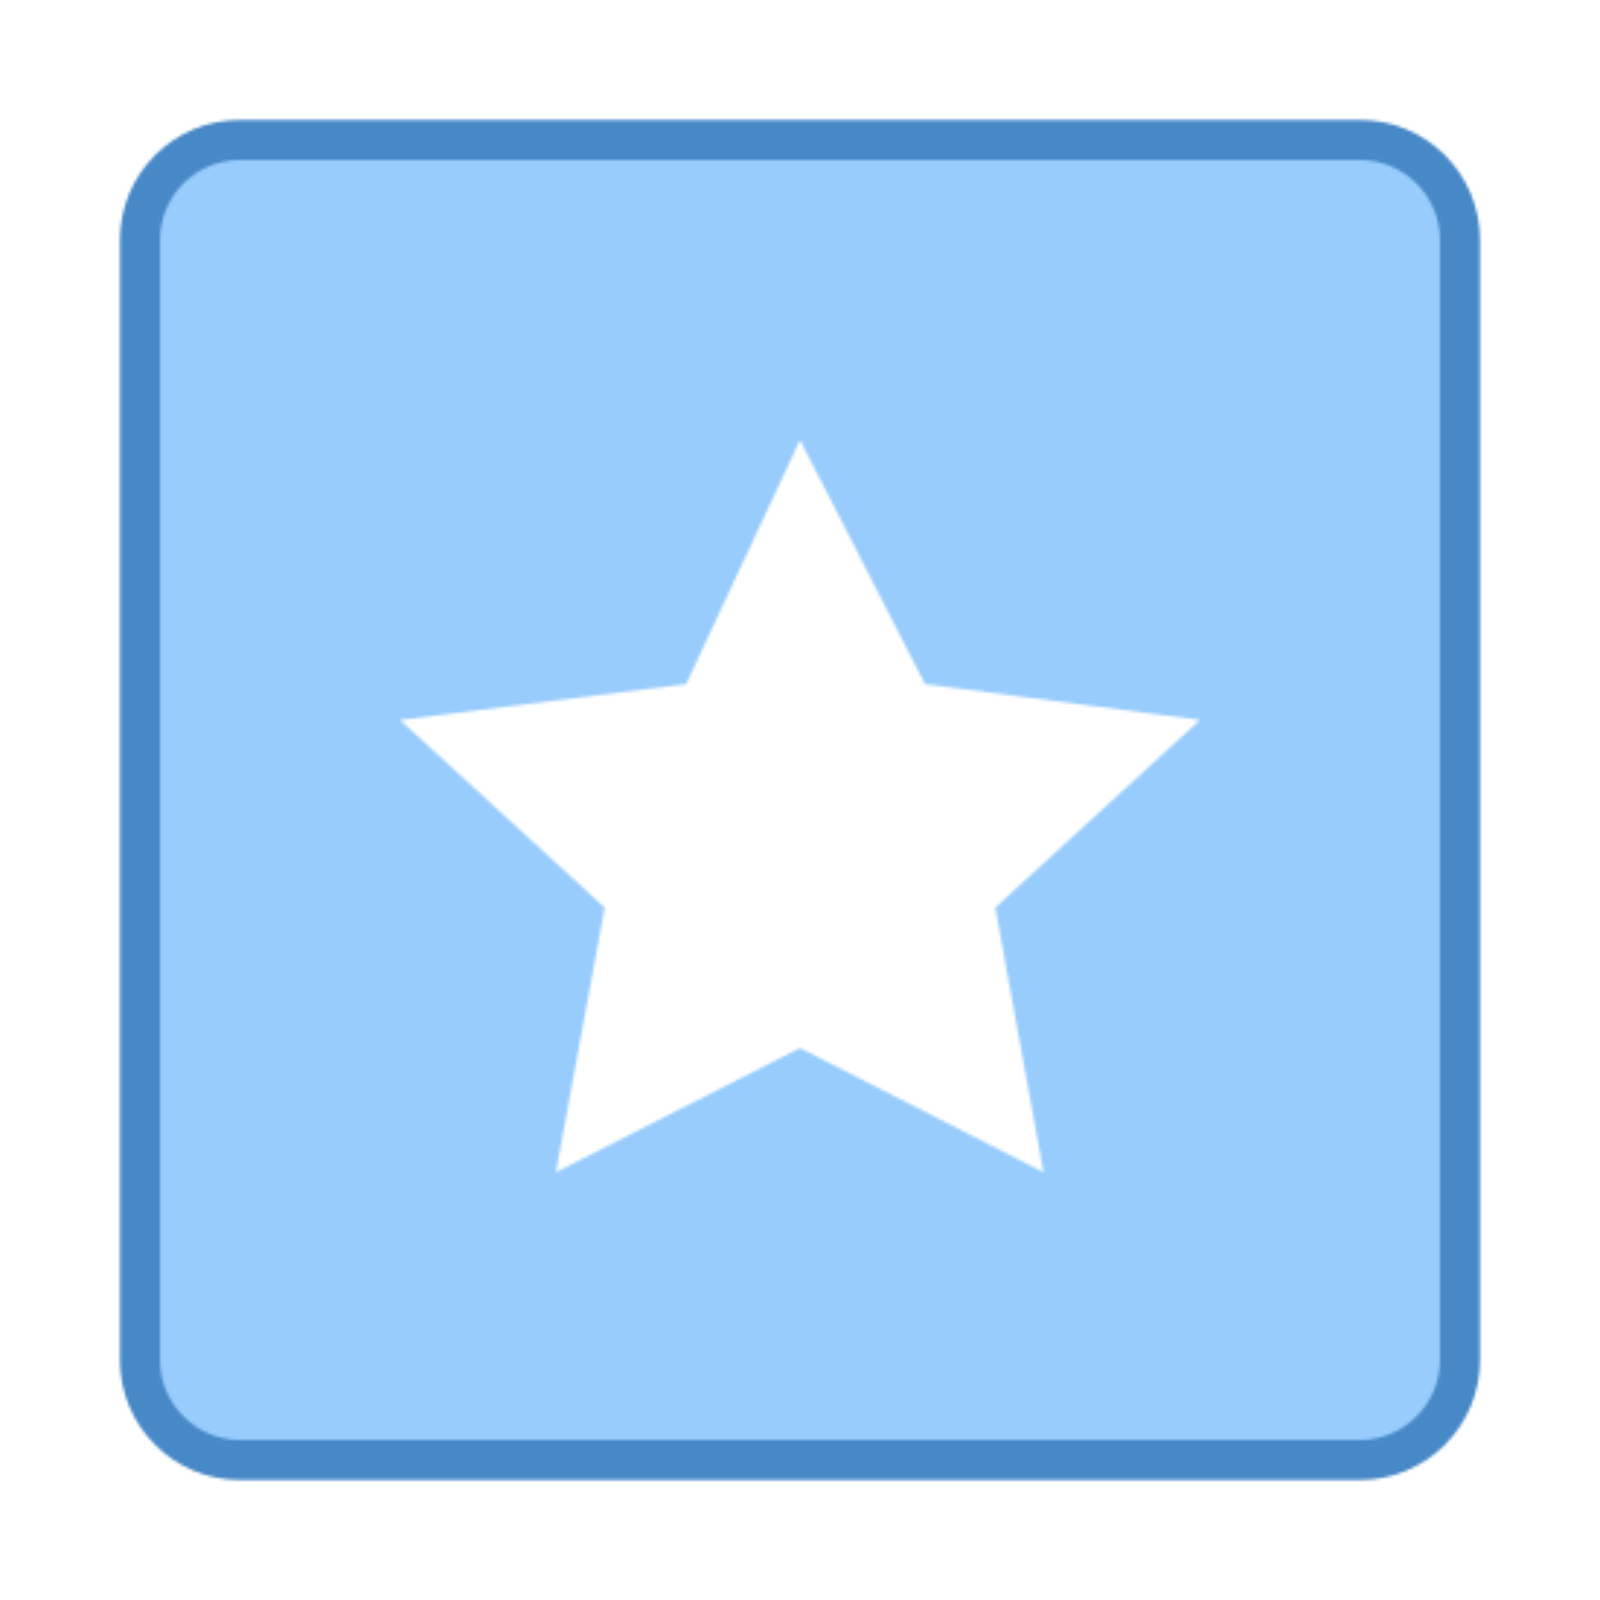 Wskaźnik icon